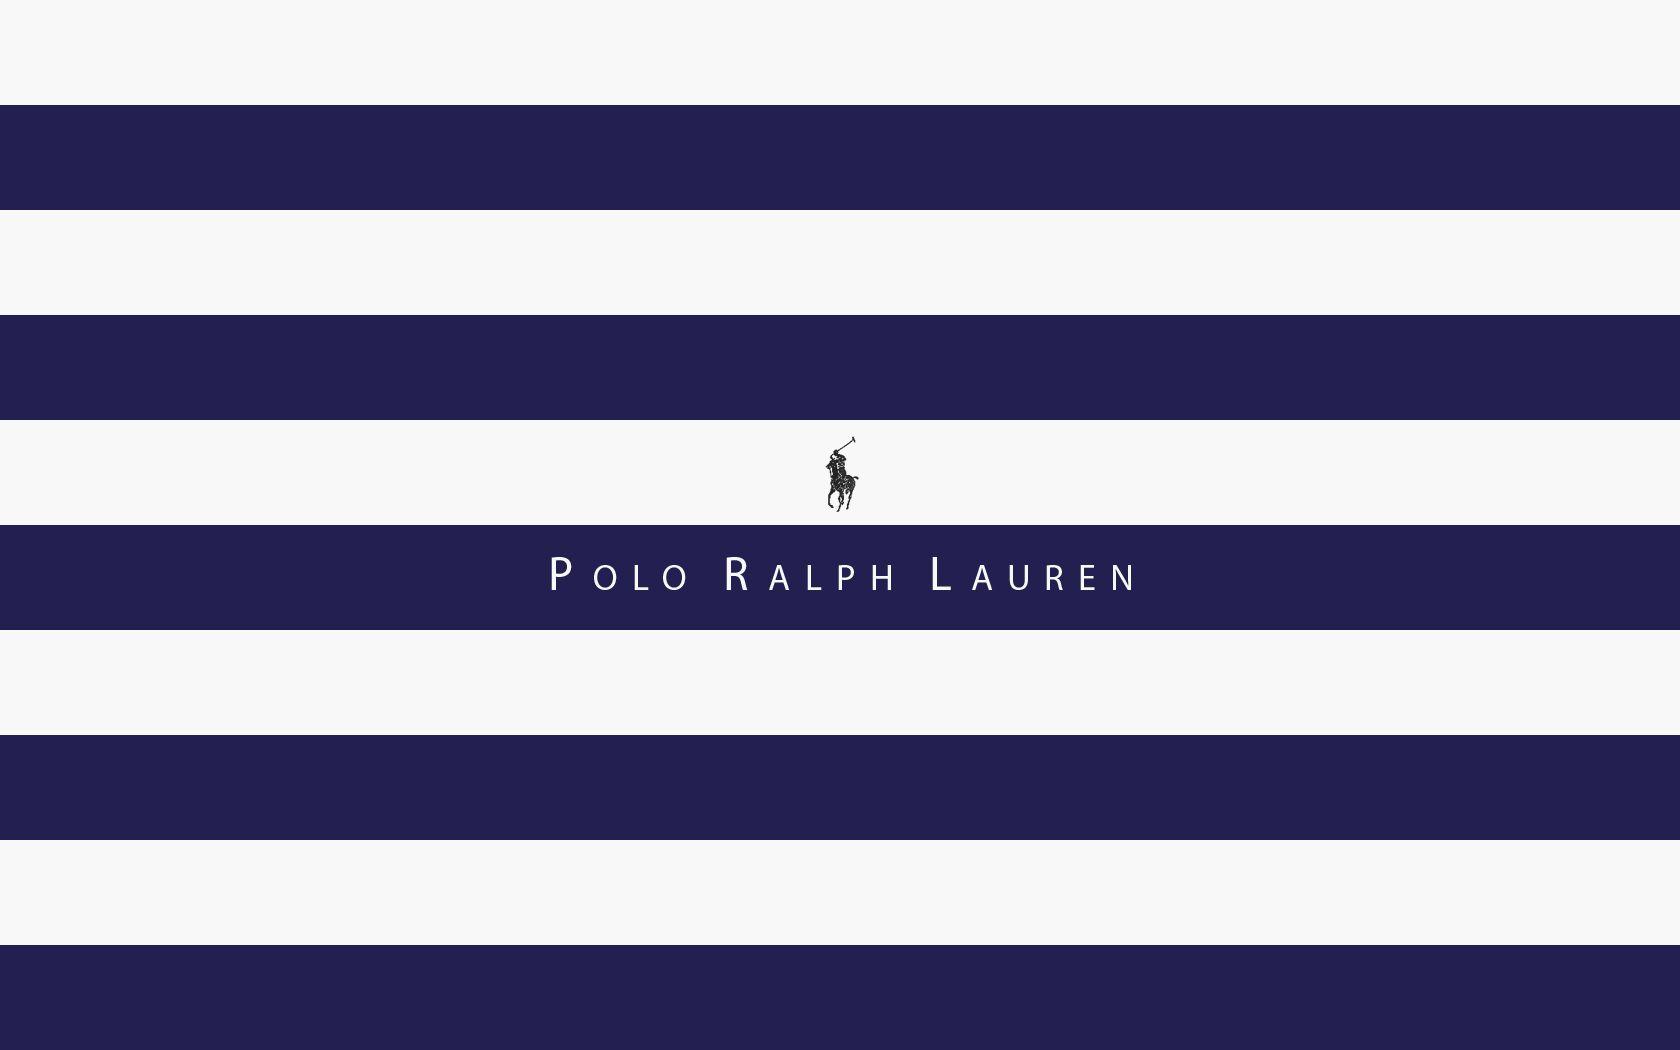 [82+] Polo Ralph Lauren Wallpapers on WallpaperSafari